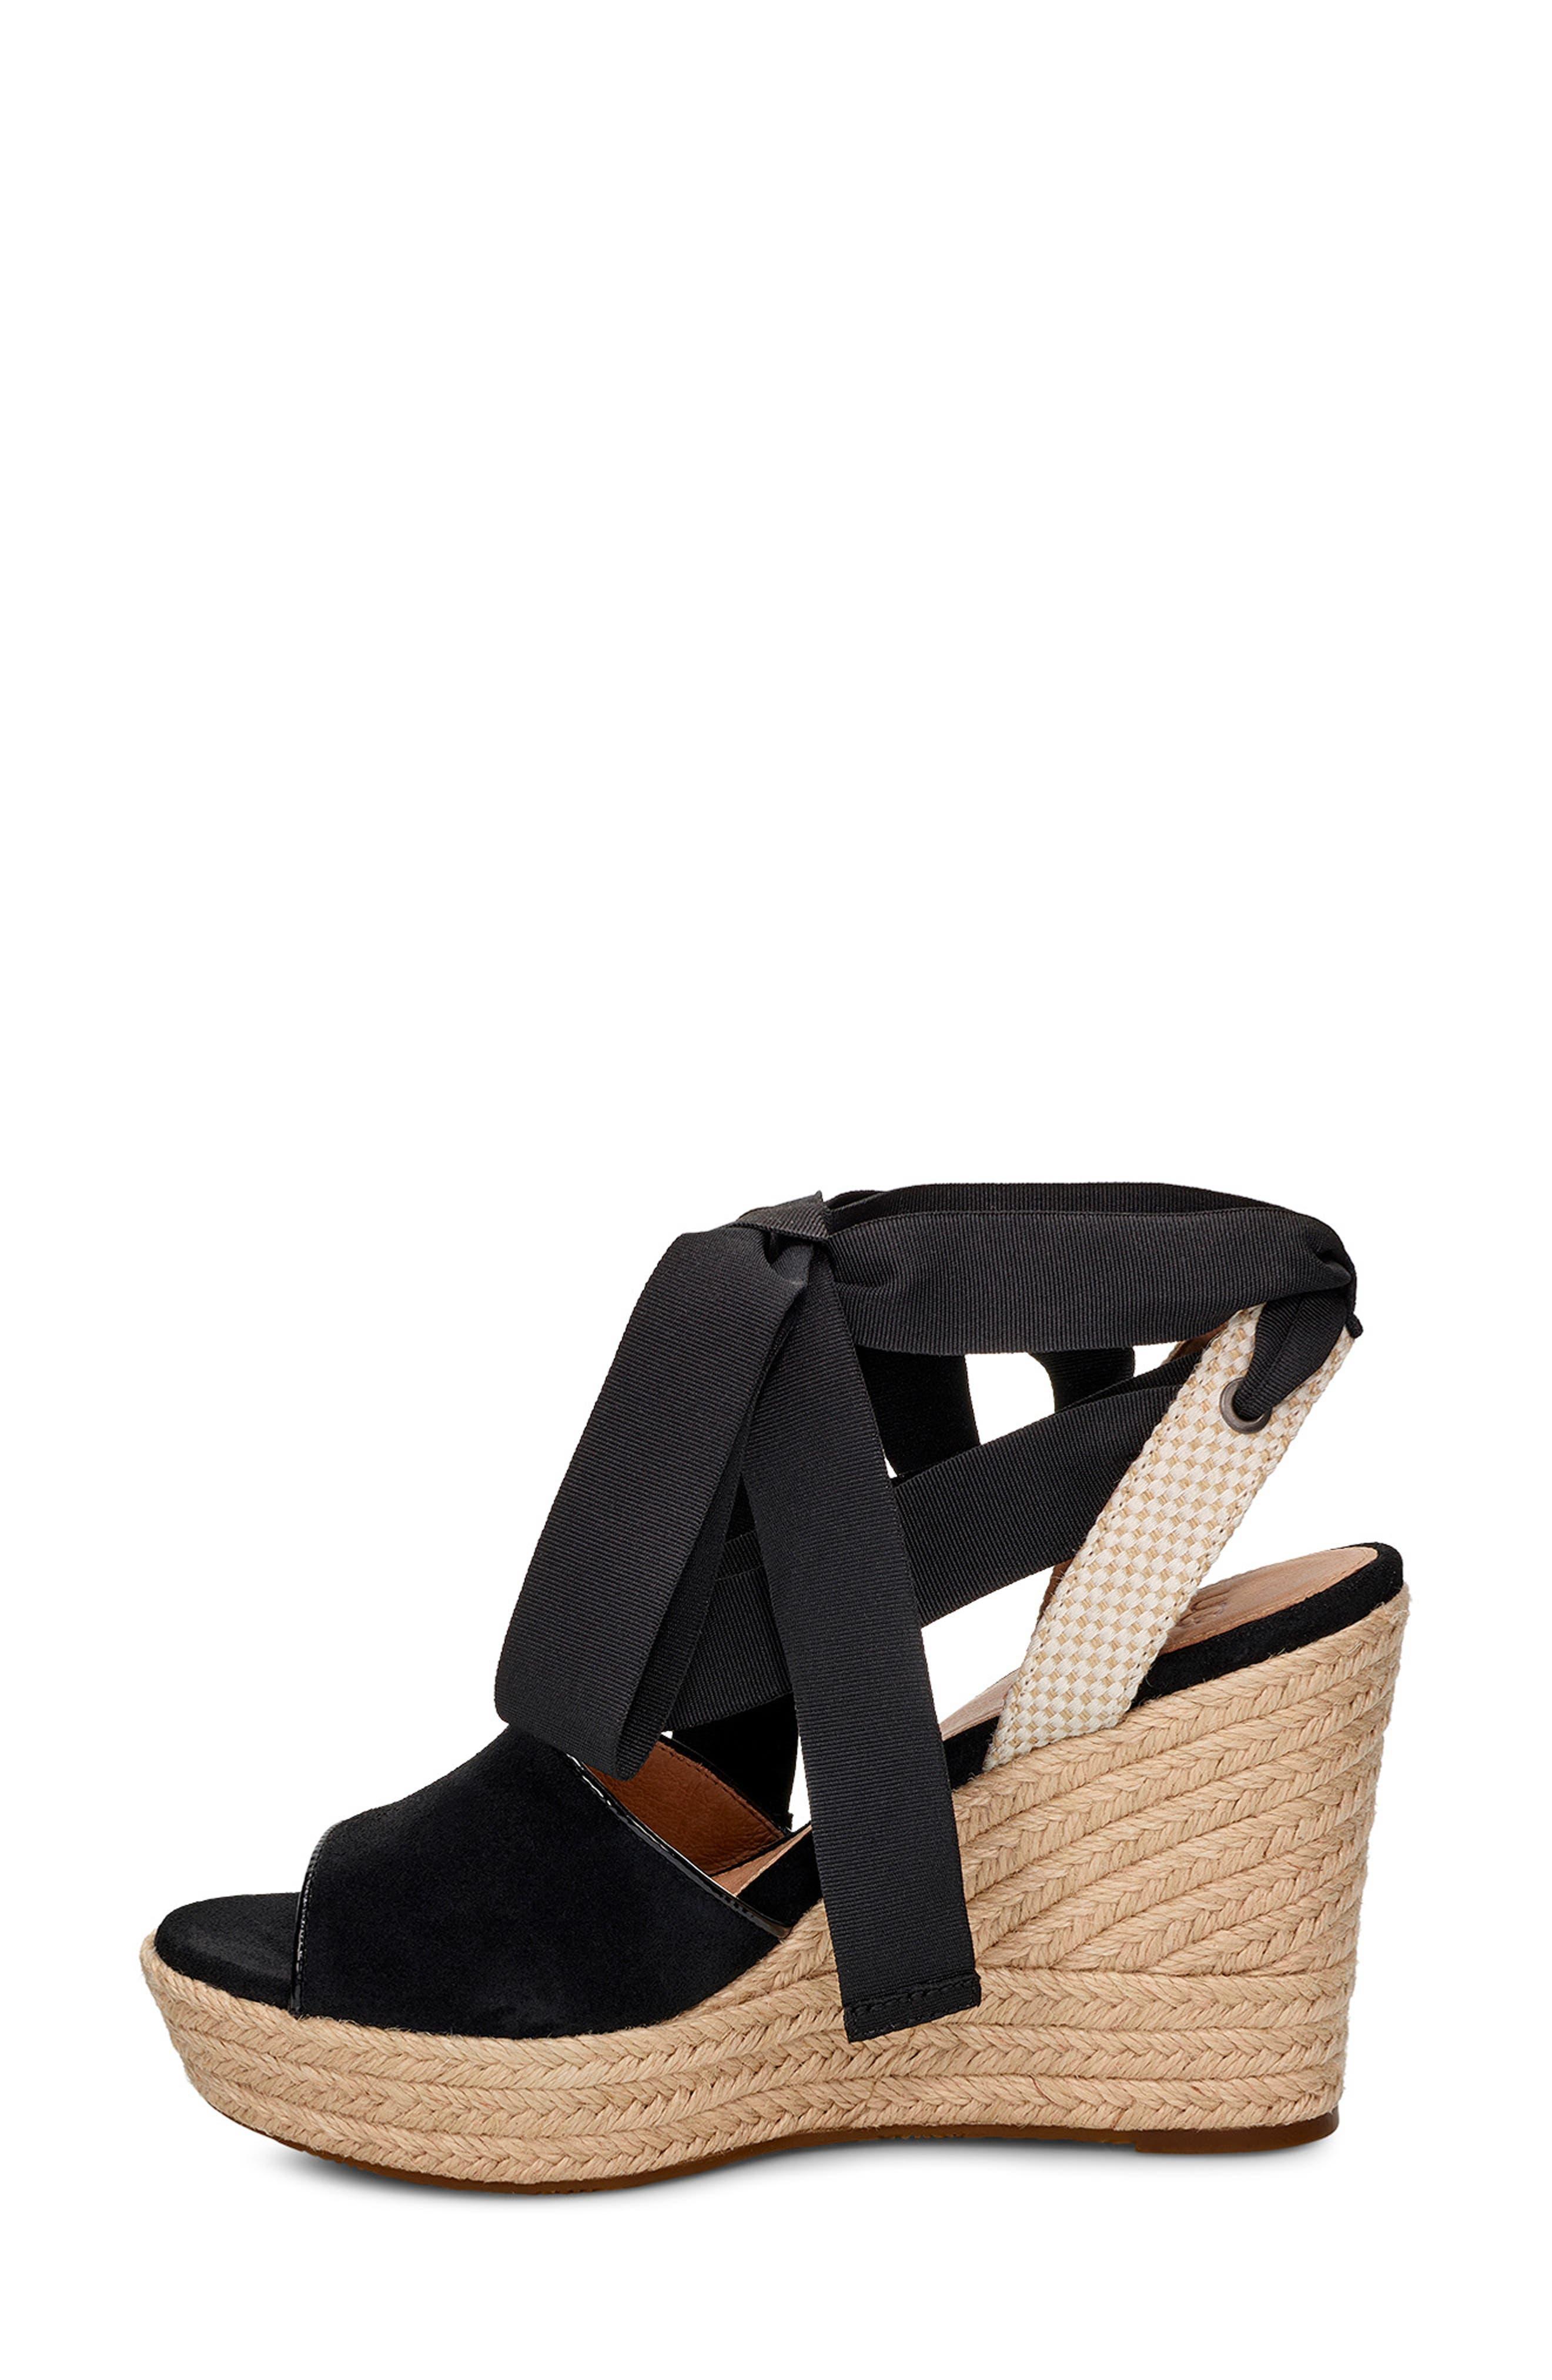 UGG<SUP>®</SUP>, Shiloh Wedge Sandal, Alternate thumbnail 6, color, BLACK FABRIC